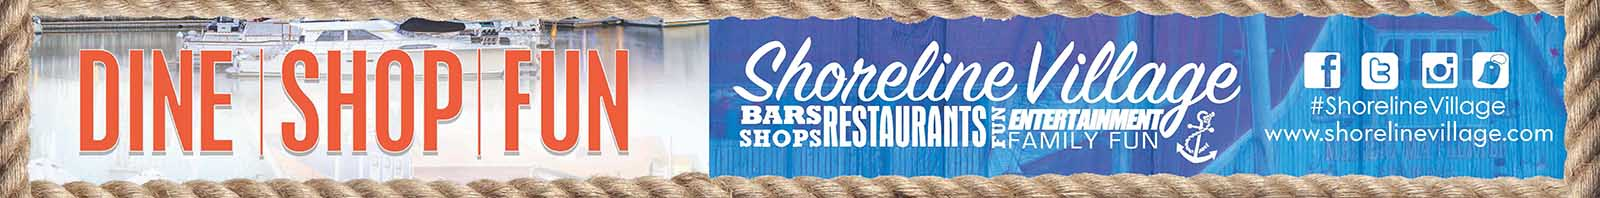 www.shorelinevillage.com